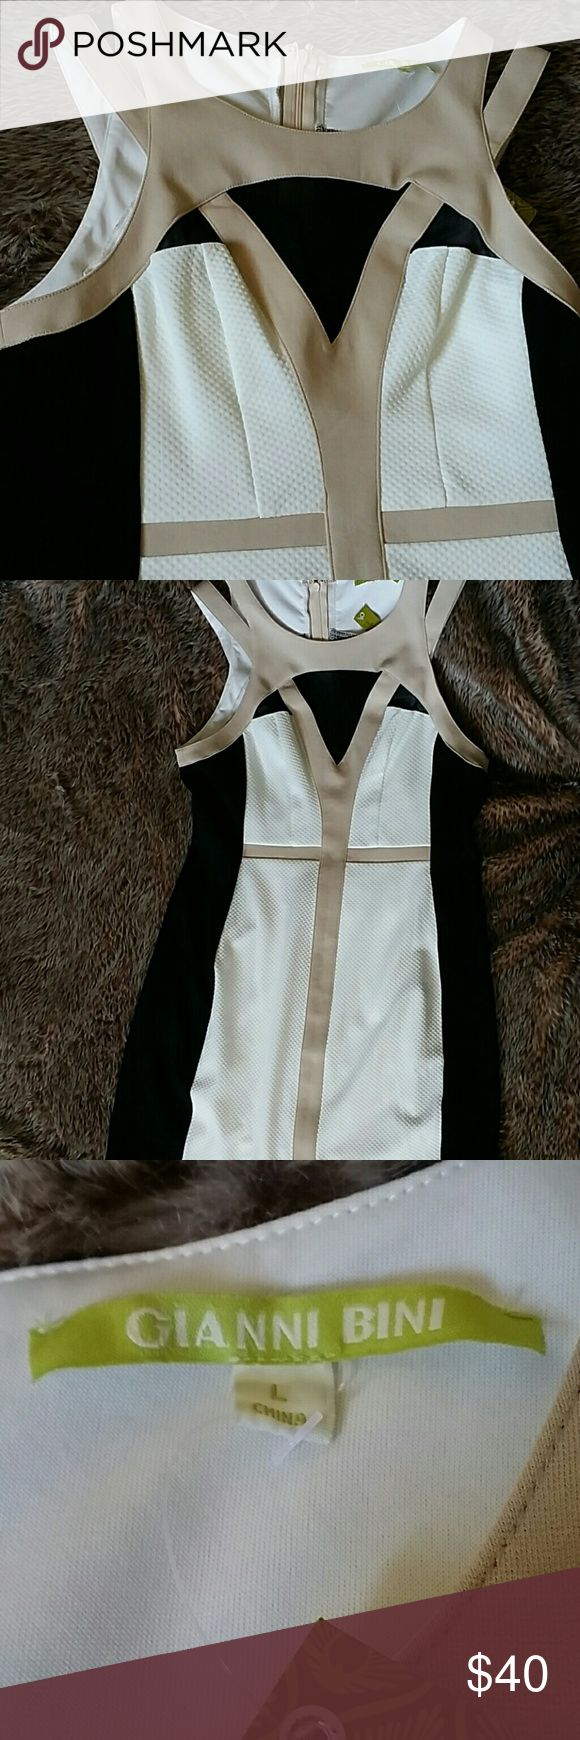 Gianni Bini Dress White ,beige, and black dress. Last picture is the back of the dress. Gianni Bini Dresses Mini